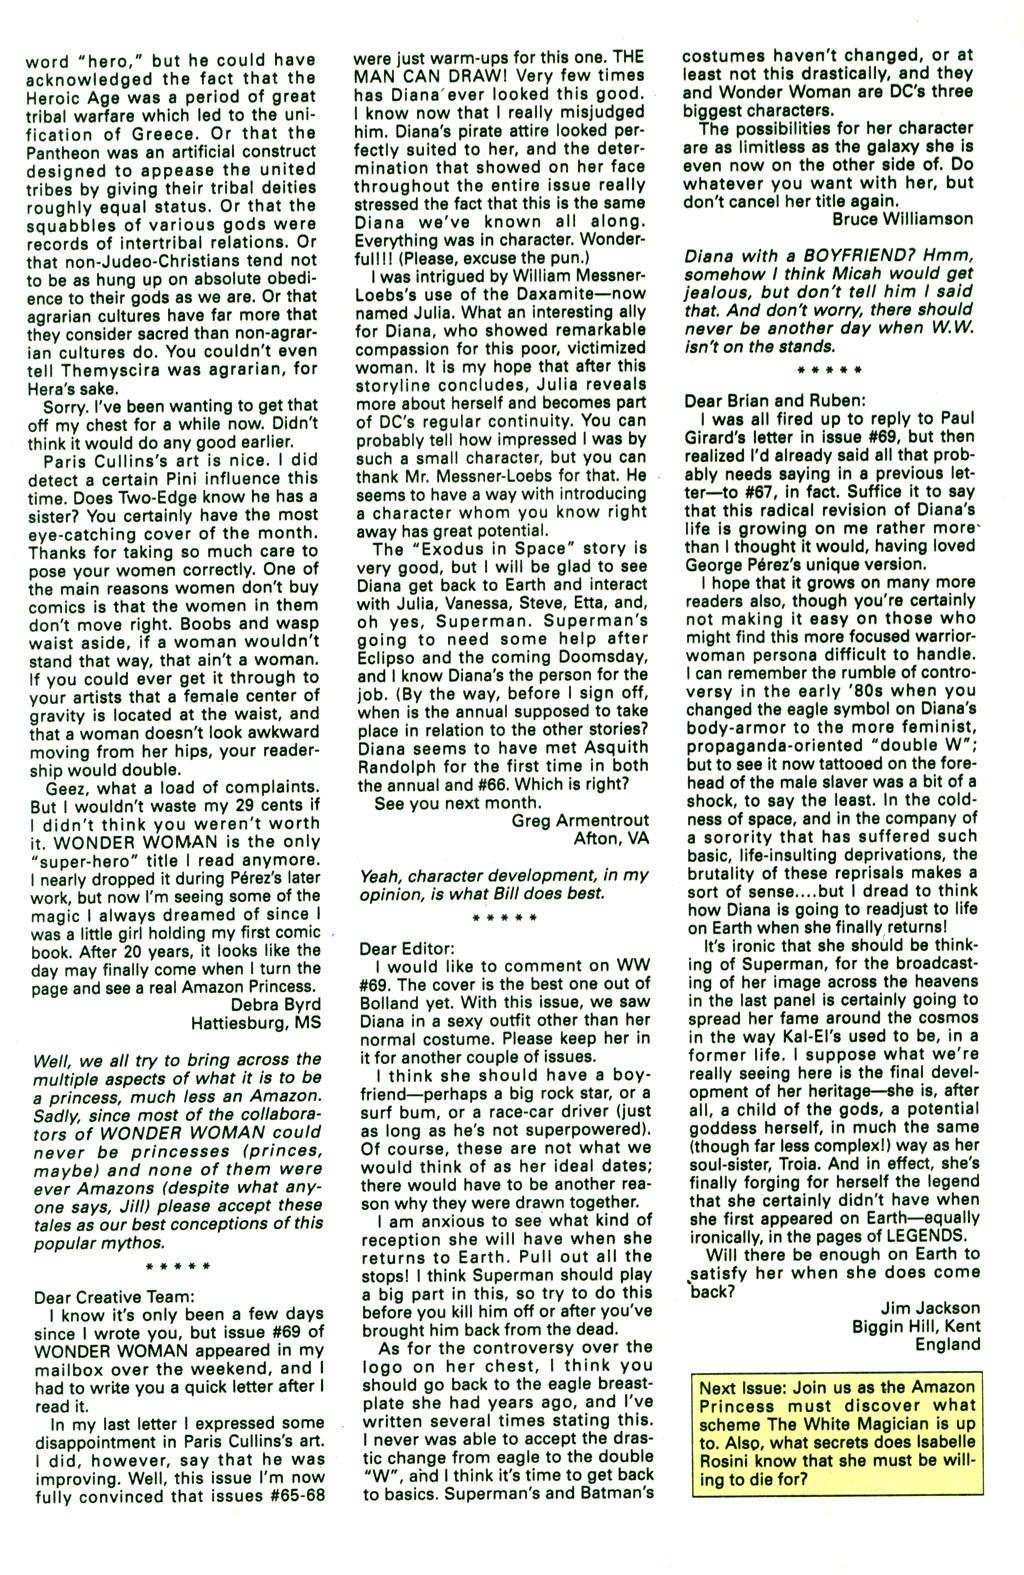 Read online Wonder Woman (1987) comic -  Issue #73 - 26